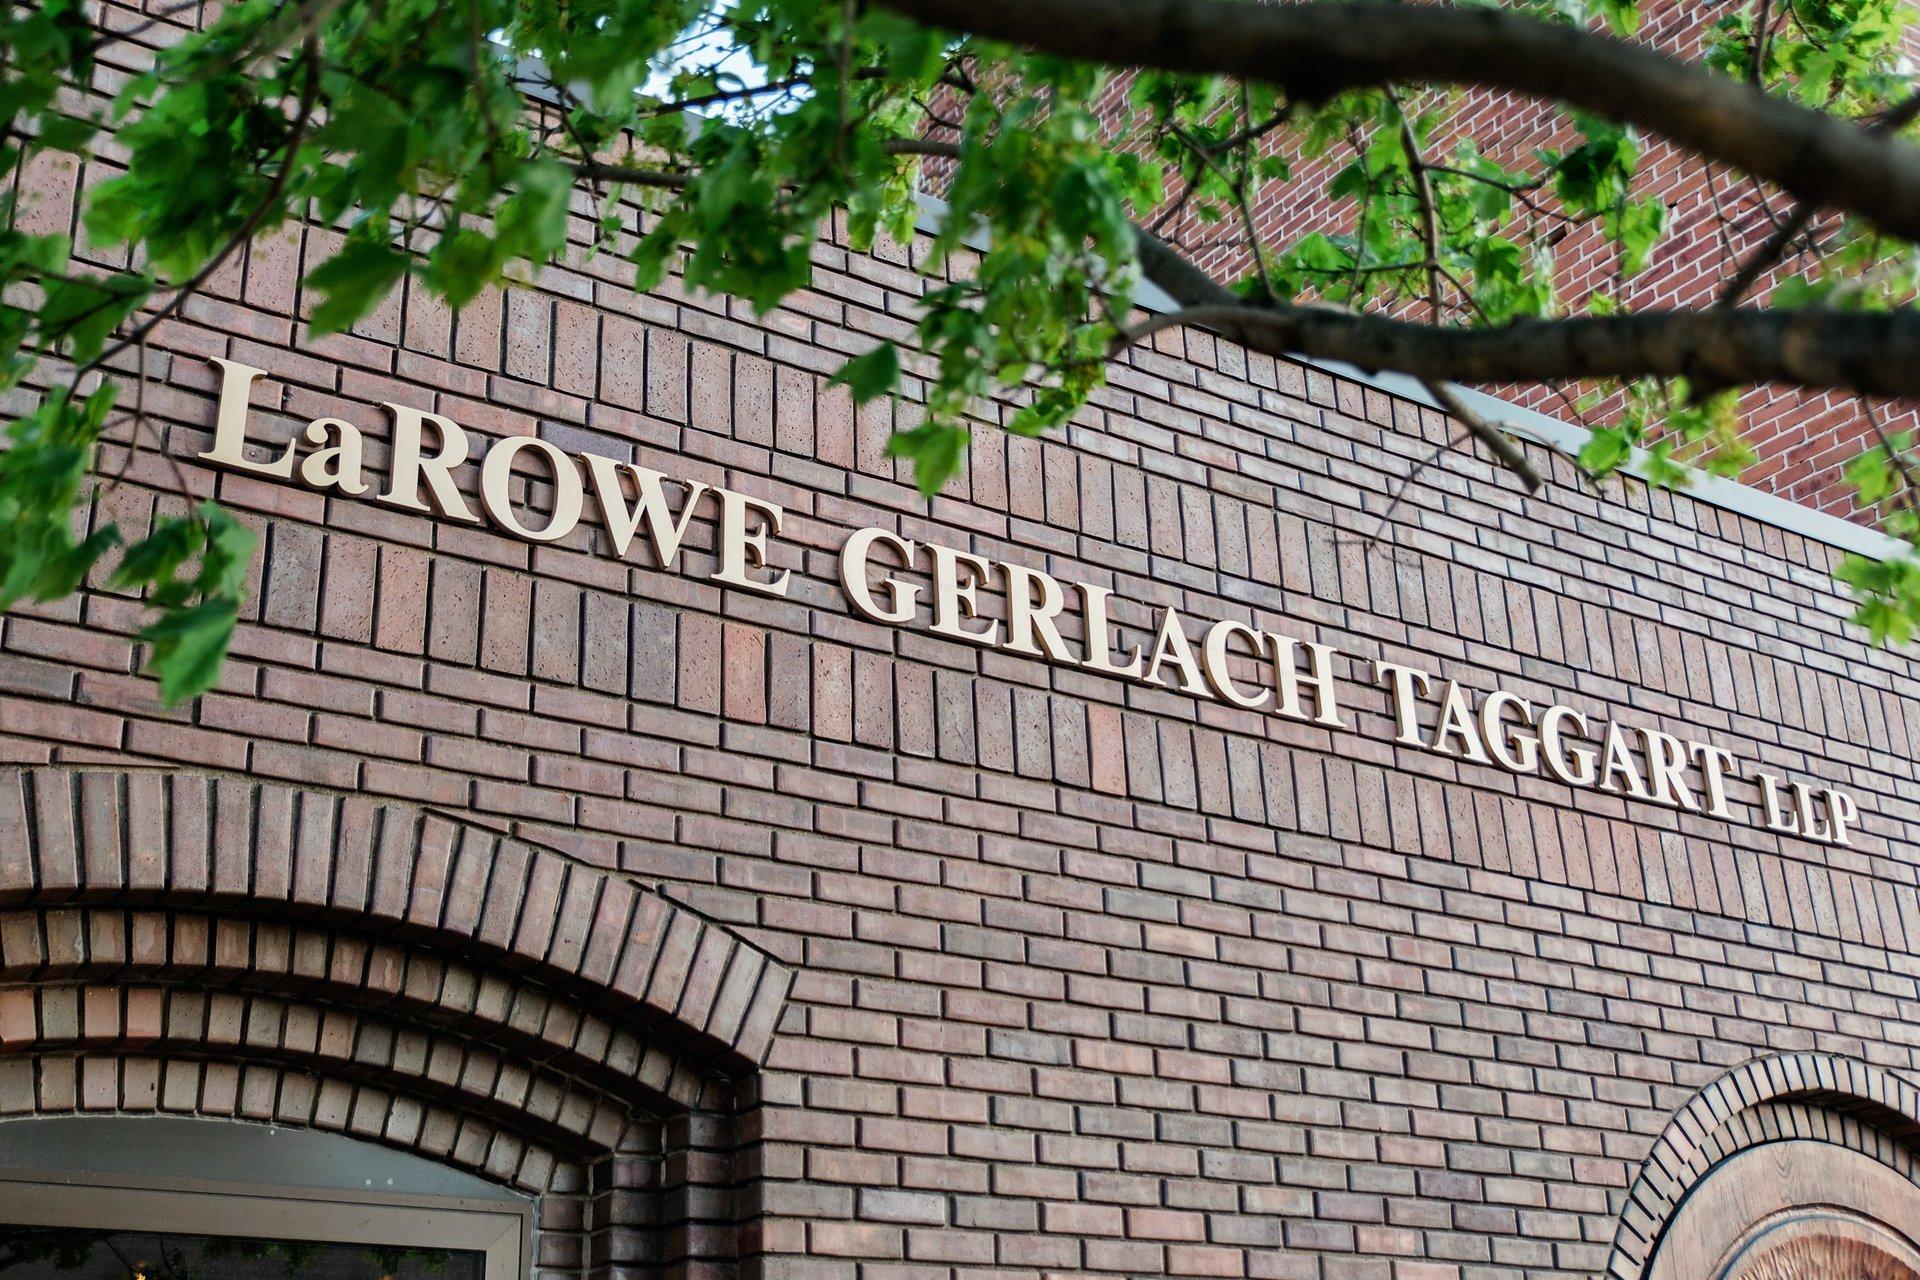 Larowe gerlach taggart llp attorneys reedsburg sauk city wi solutioingenieria Images